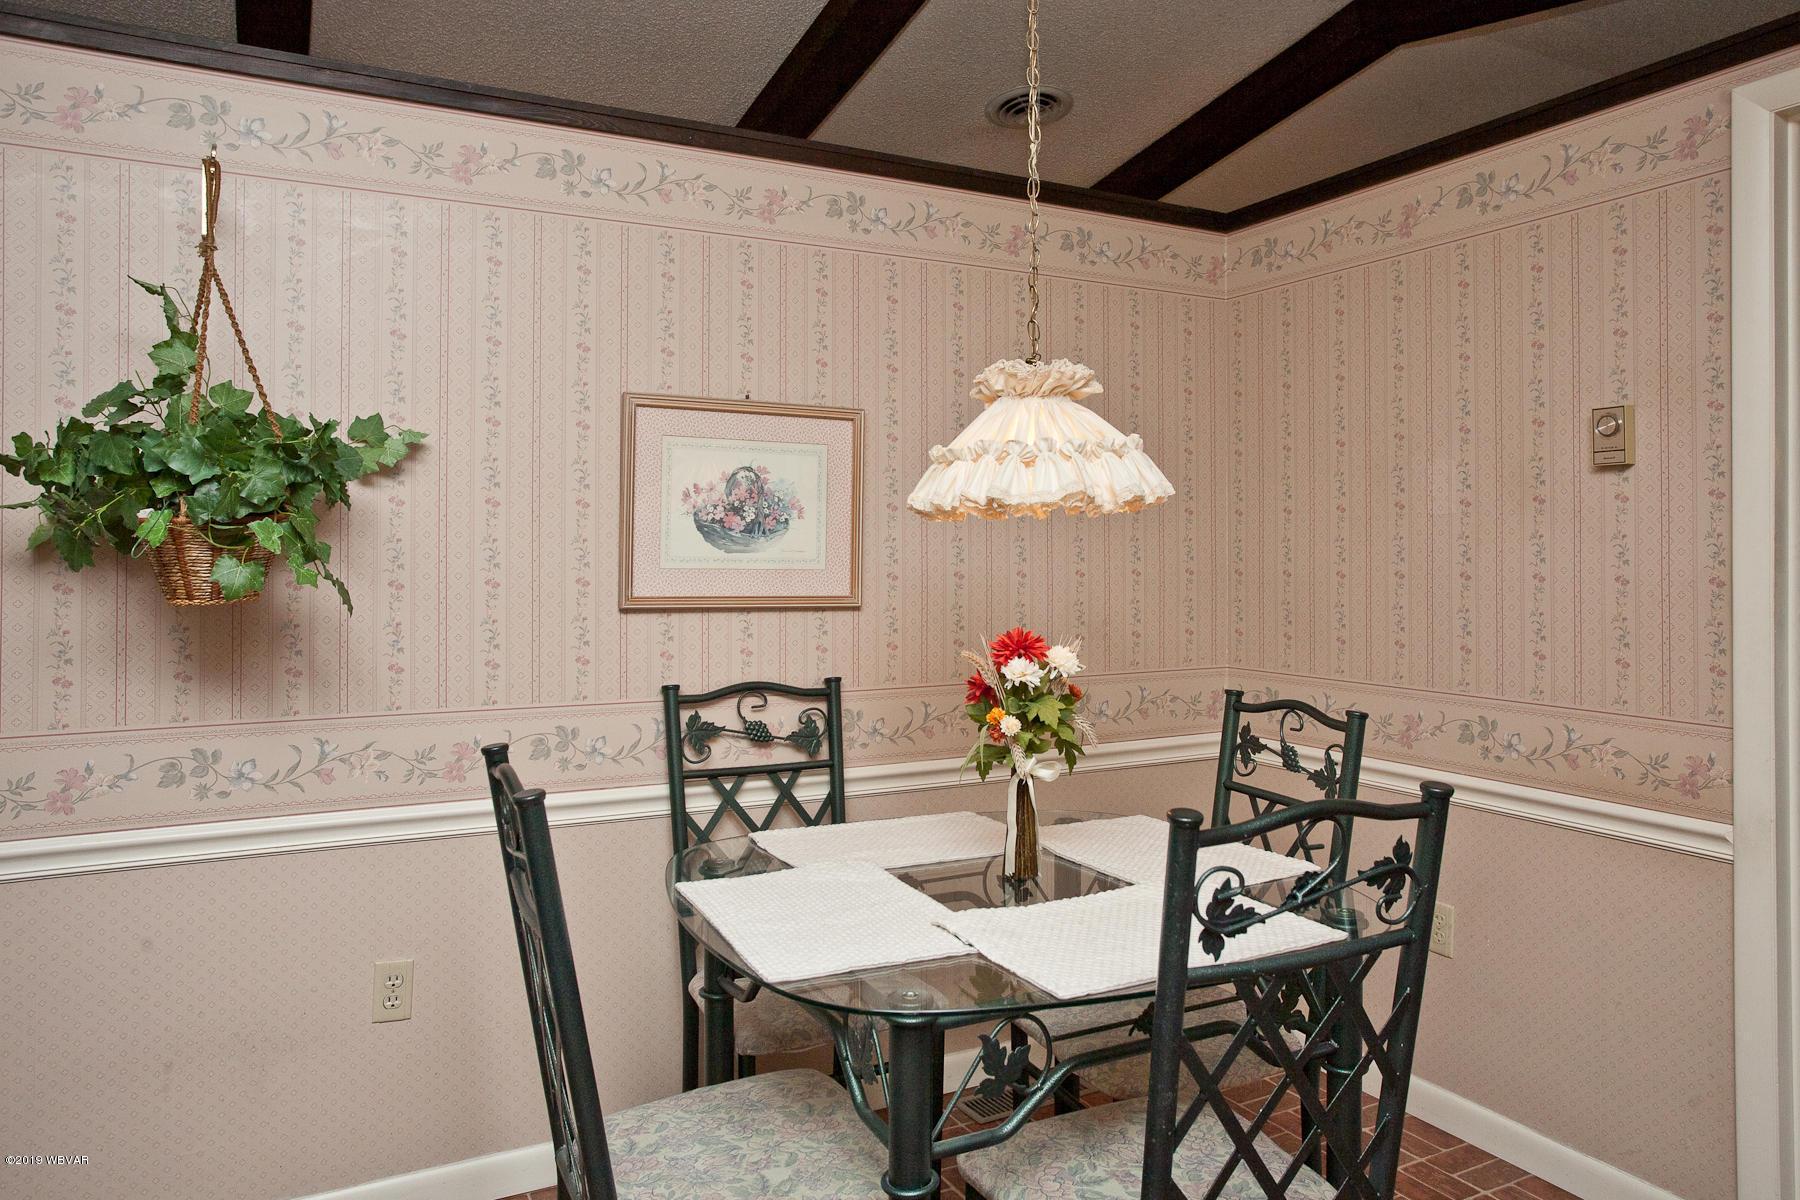 116 ABERDEEN ROAD,Williamsport,PA 17701,4 Bedrooms Bedrooms,3 BathroomsBathrooms,Residential,ABERDEEN,WB-88520